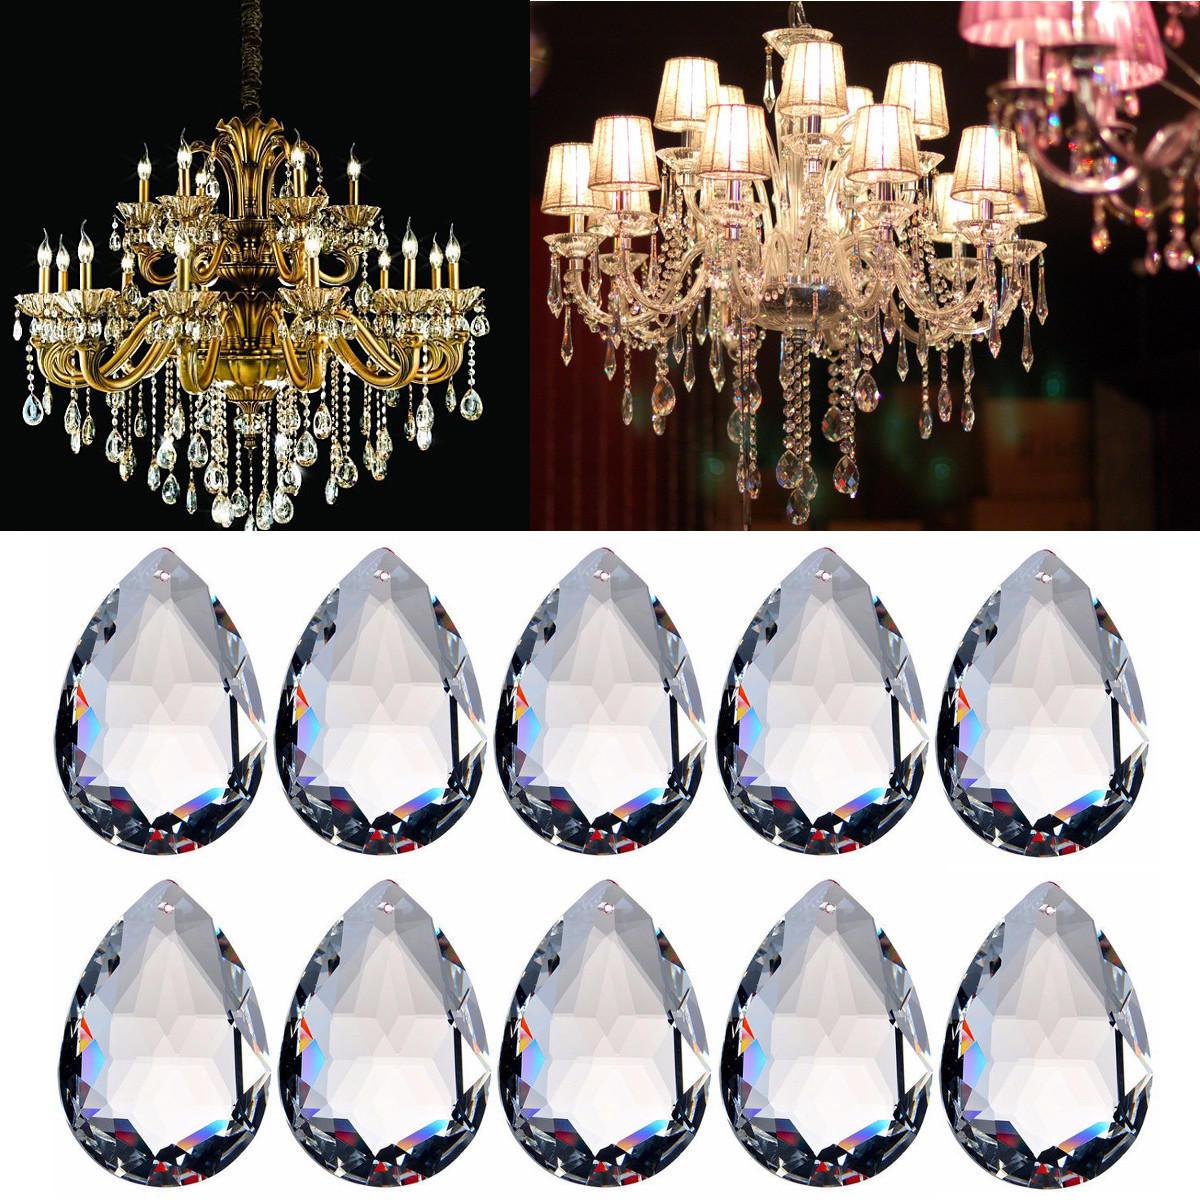 Responsible Art Glass Lighting Amber Glass Bohemian Crystal Chandelier Products Hot Sale Lights & Lighting